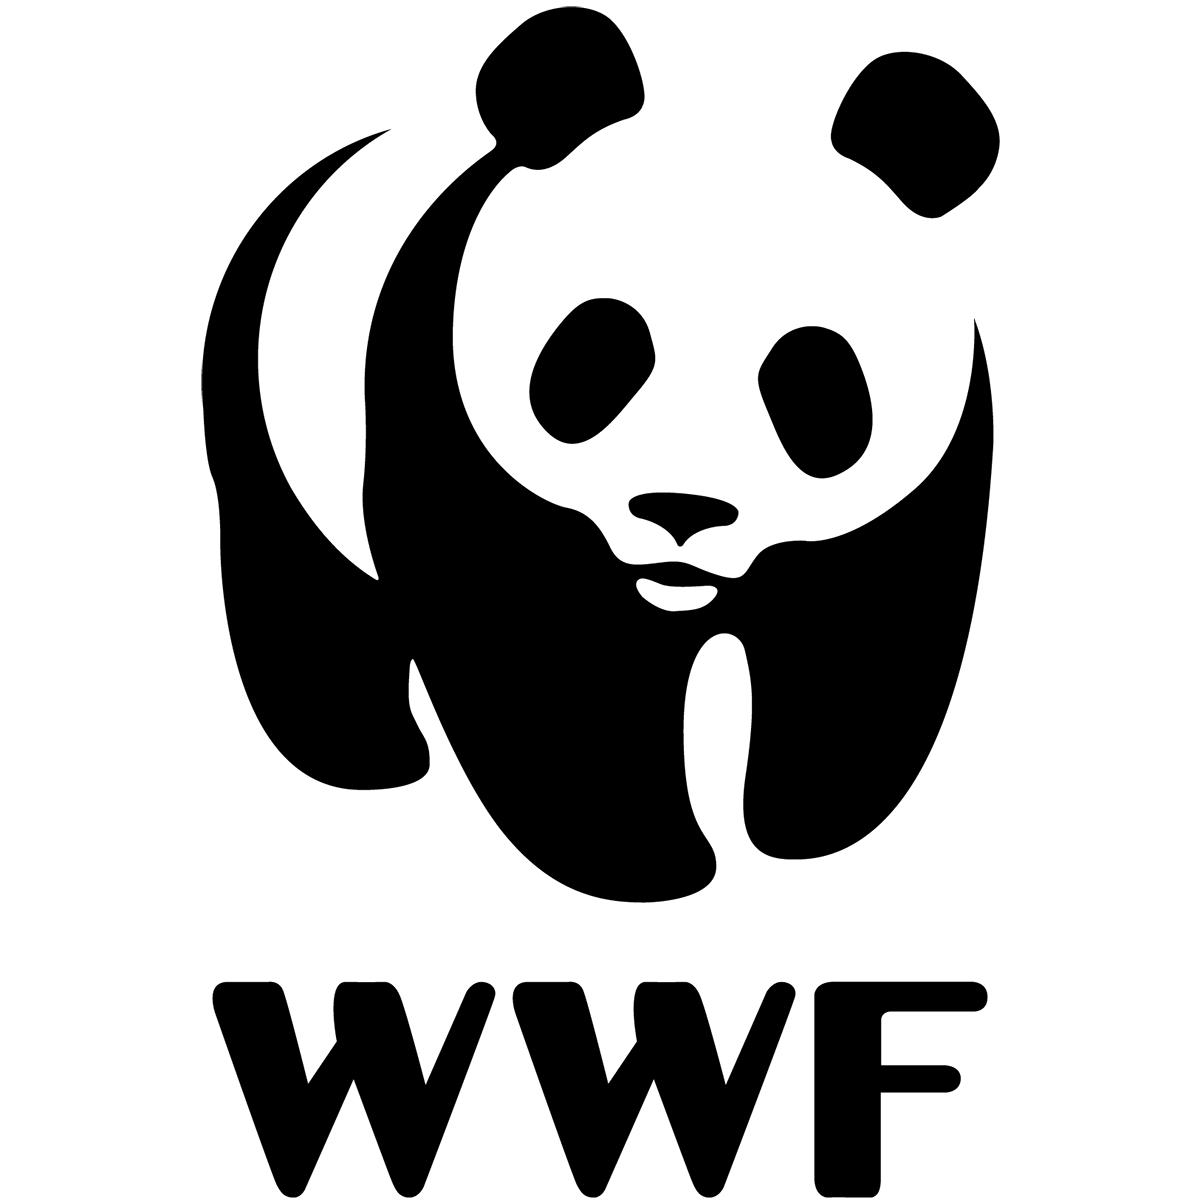 Biofriendly is proud to support the World Wildlife Fund